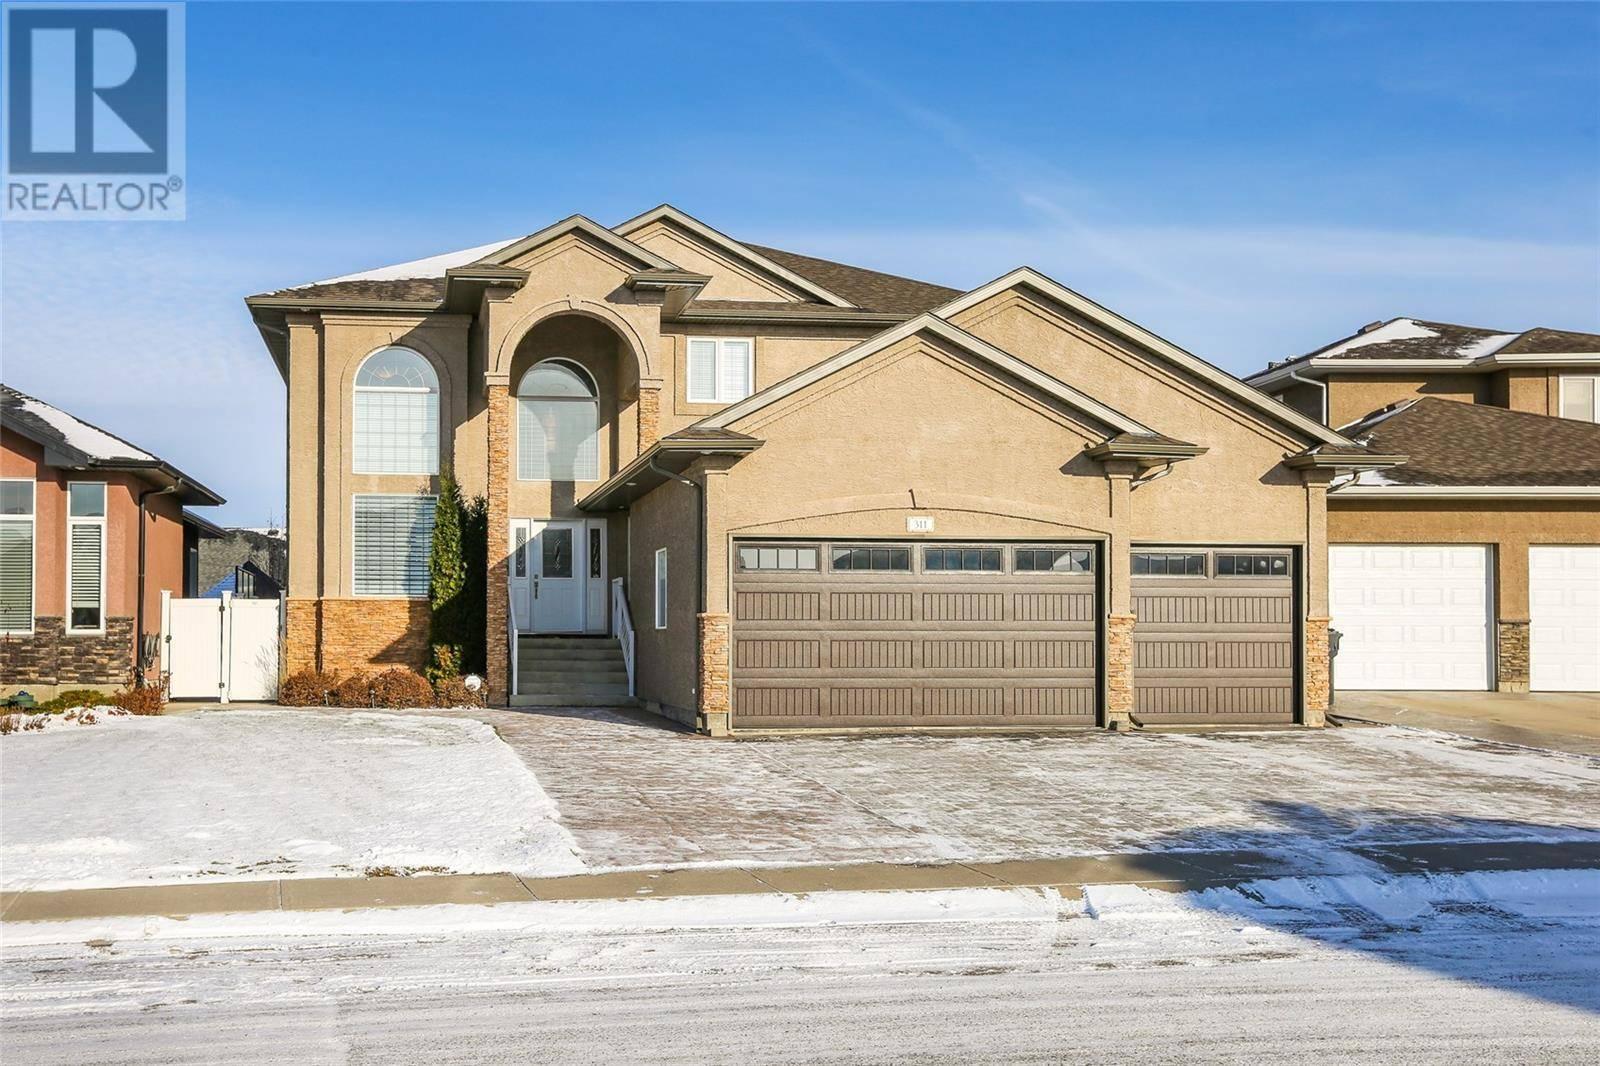 House for sale at 311 Beechwood Cres Saskatoon Saskatchewan - MLS: SK791256